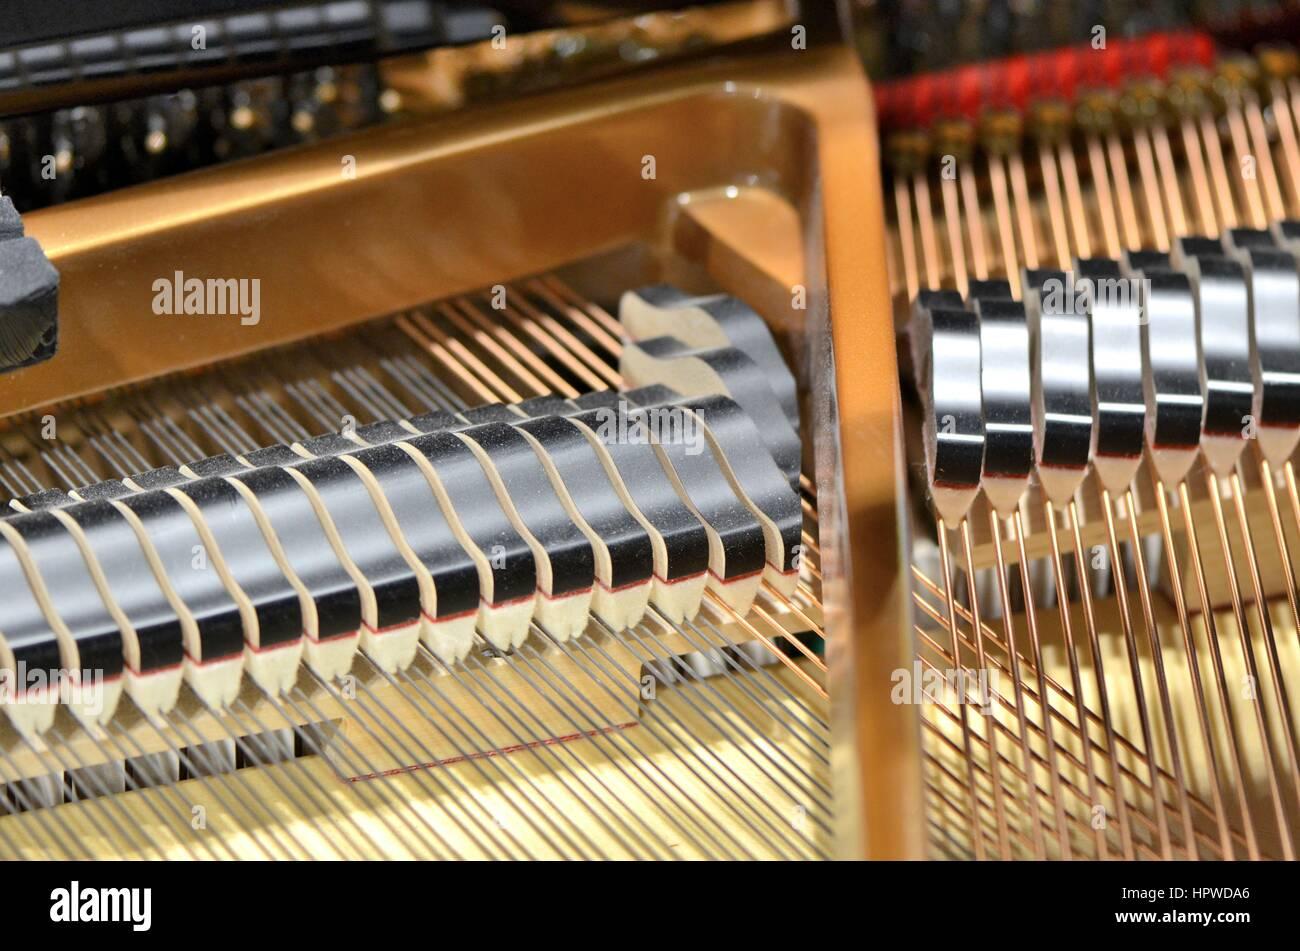 Piano Makers Stockfotos & Piano Makers Bilder - Alamy